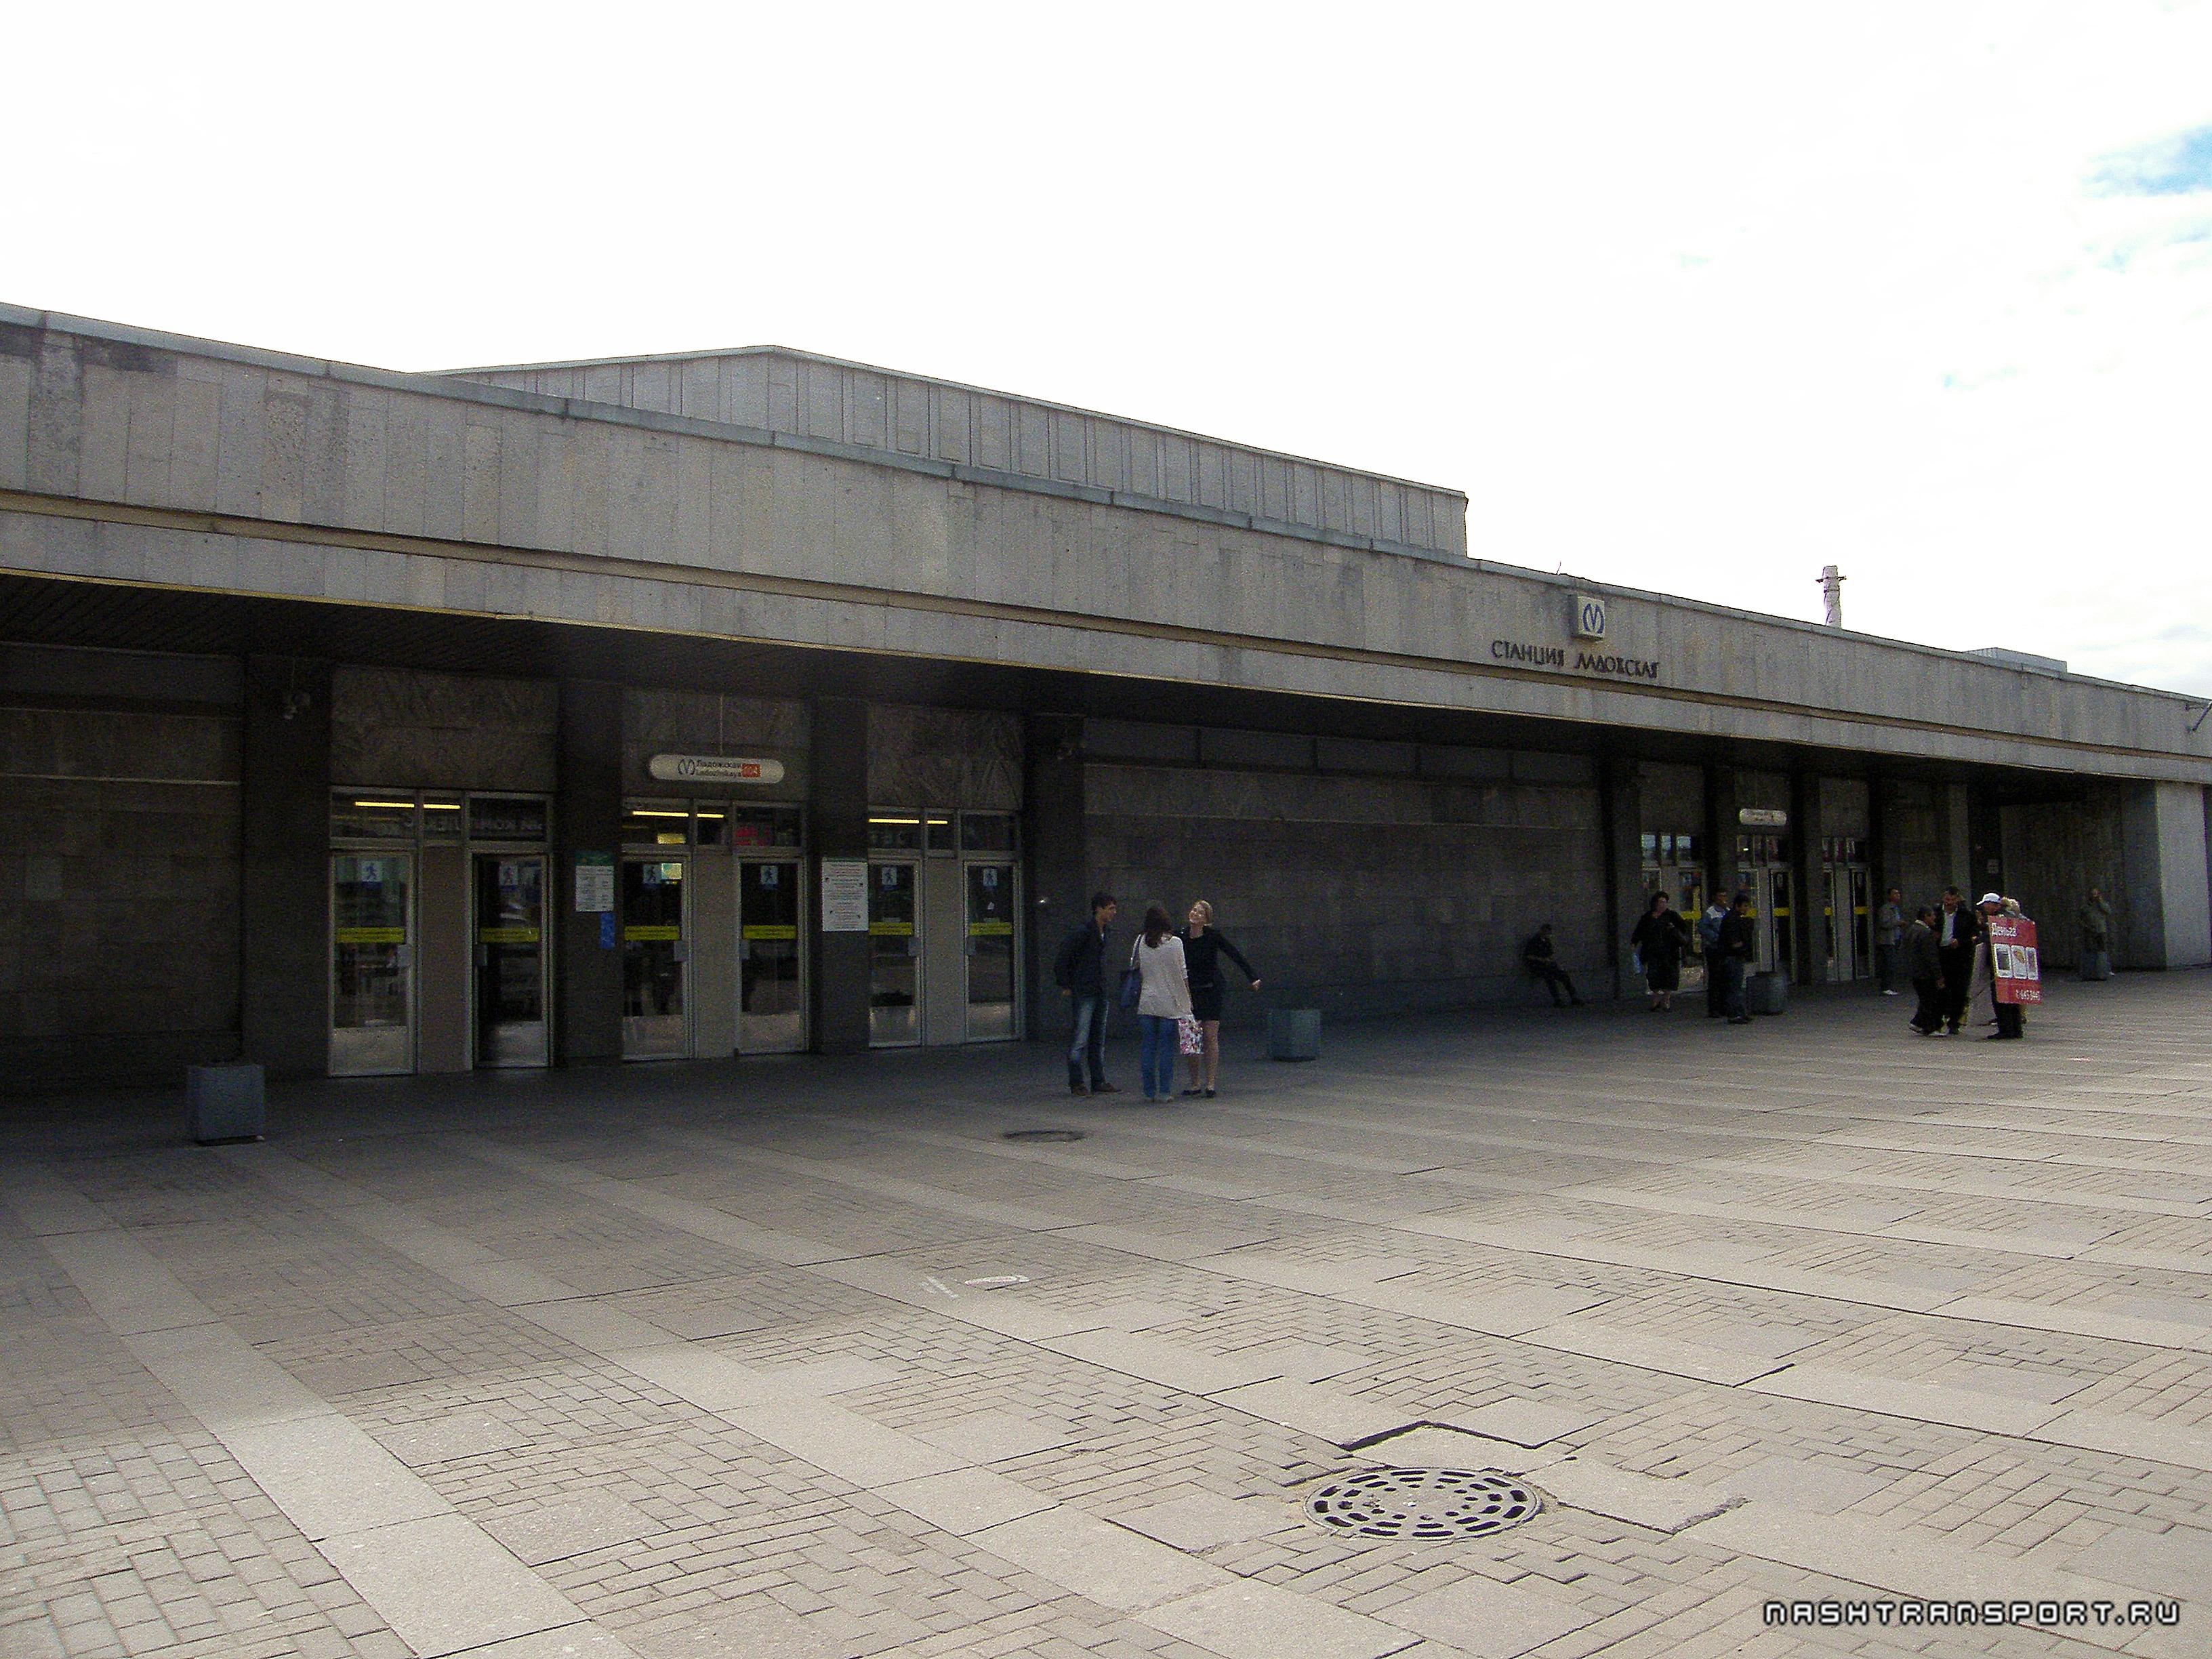 девушки-красноармейки метро красногвардейская в ленинграде фото значит